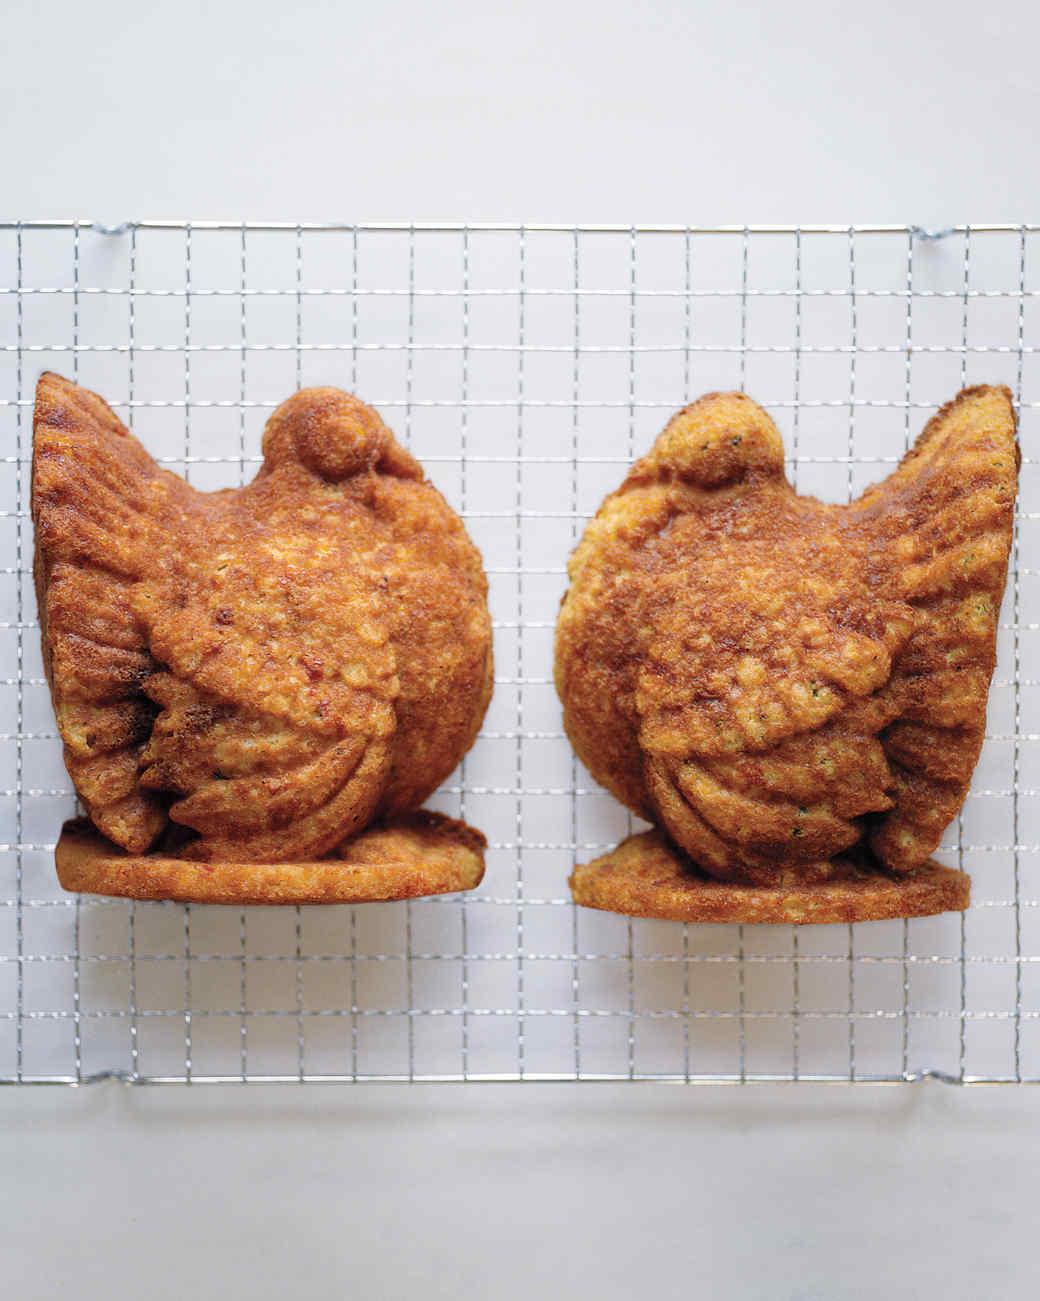 cornbread-turkey-1111-A104679.jpg